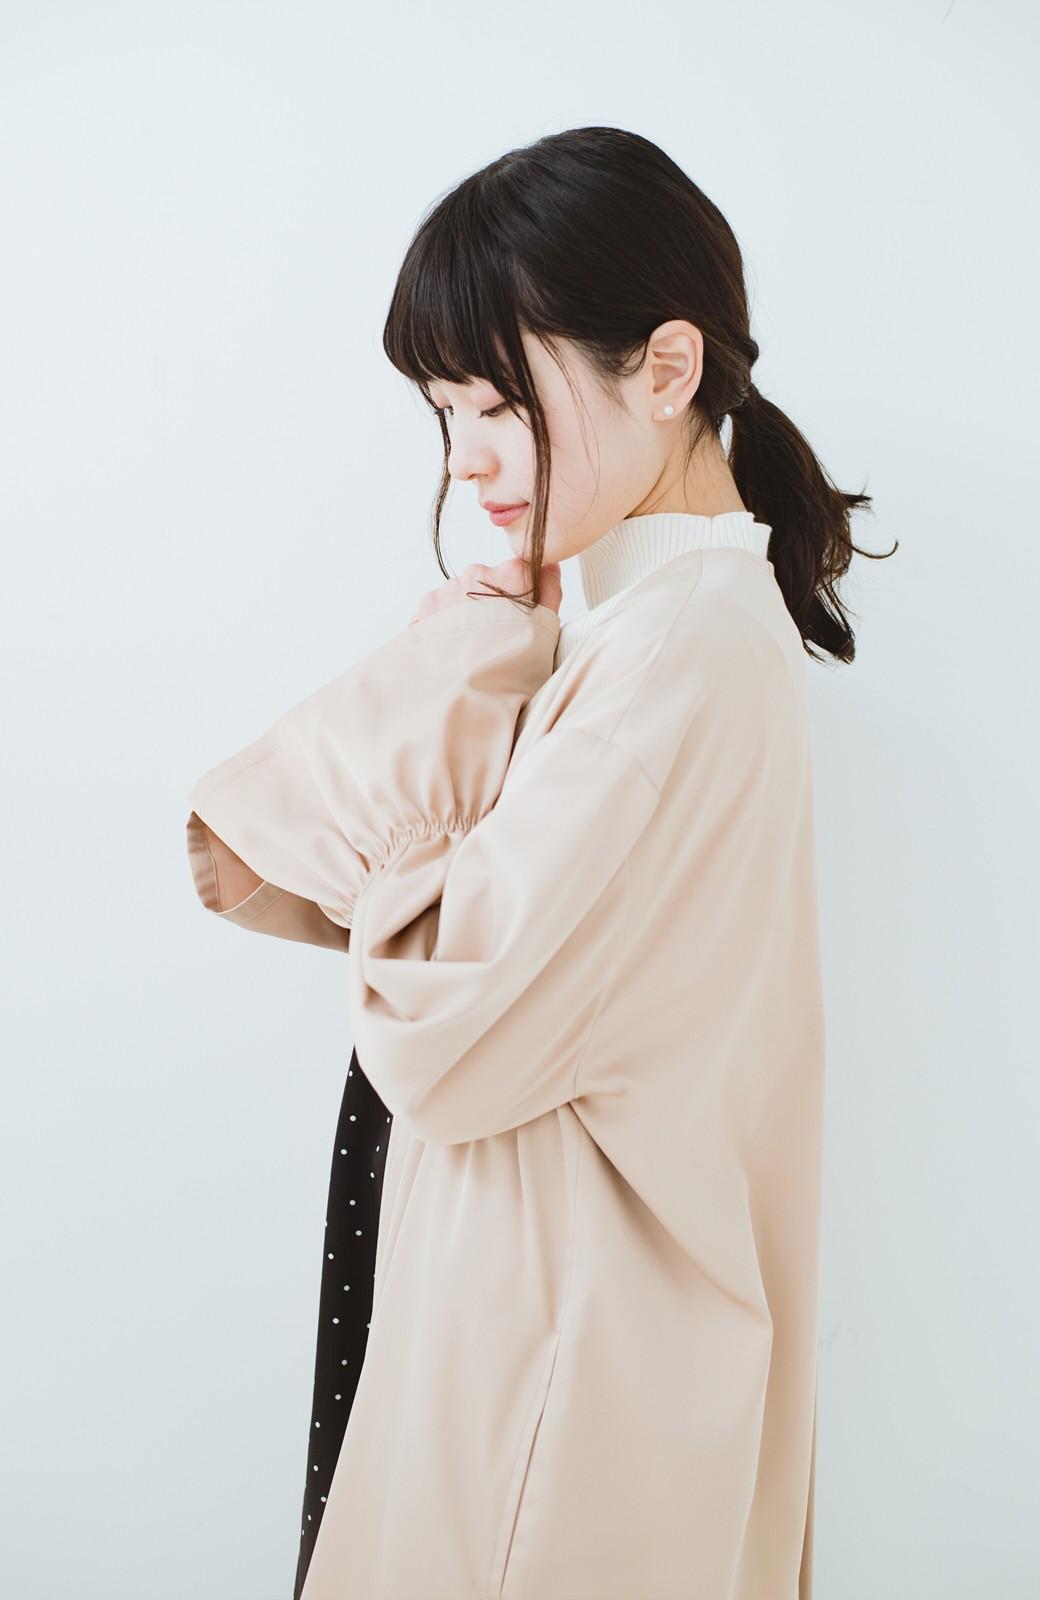 haco! ただ羽織るだけでオシャレに見える 気軽なフレアースリーブコート <ベージュ>の商品写真11